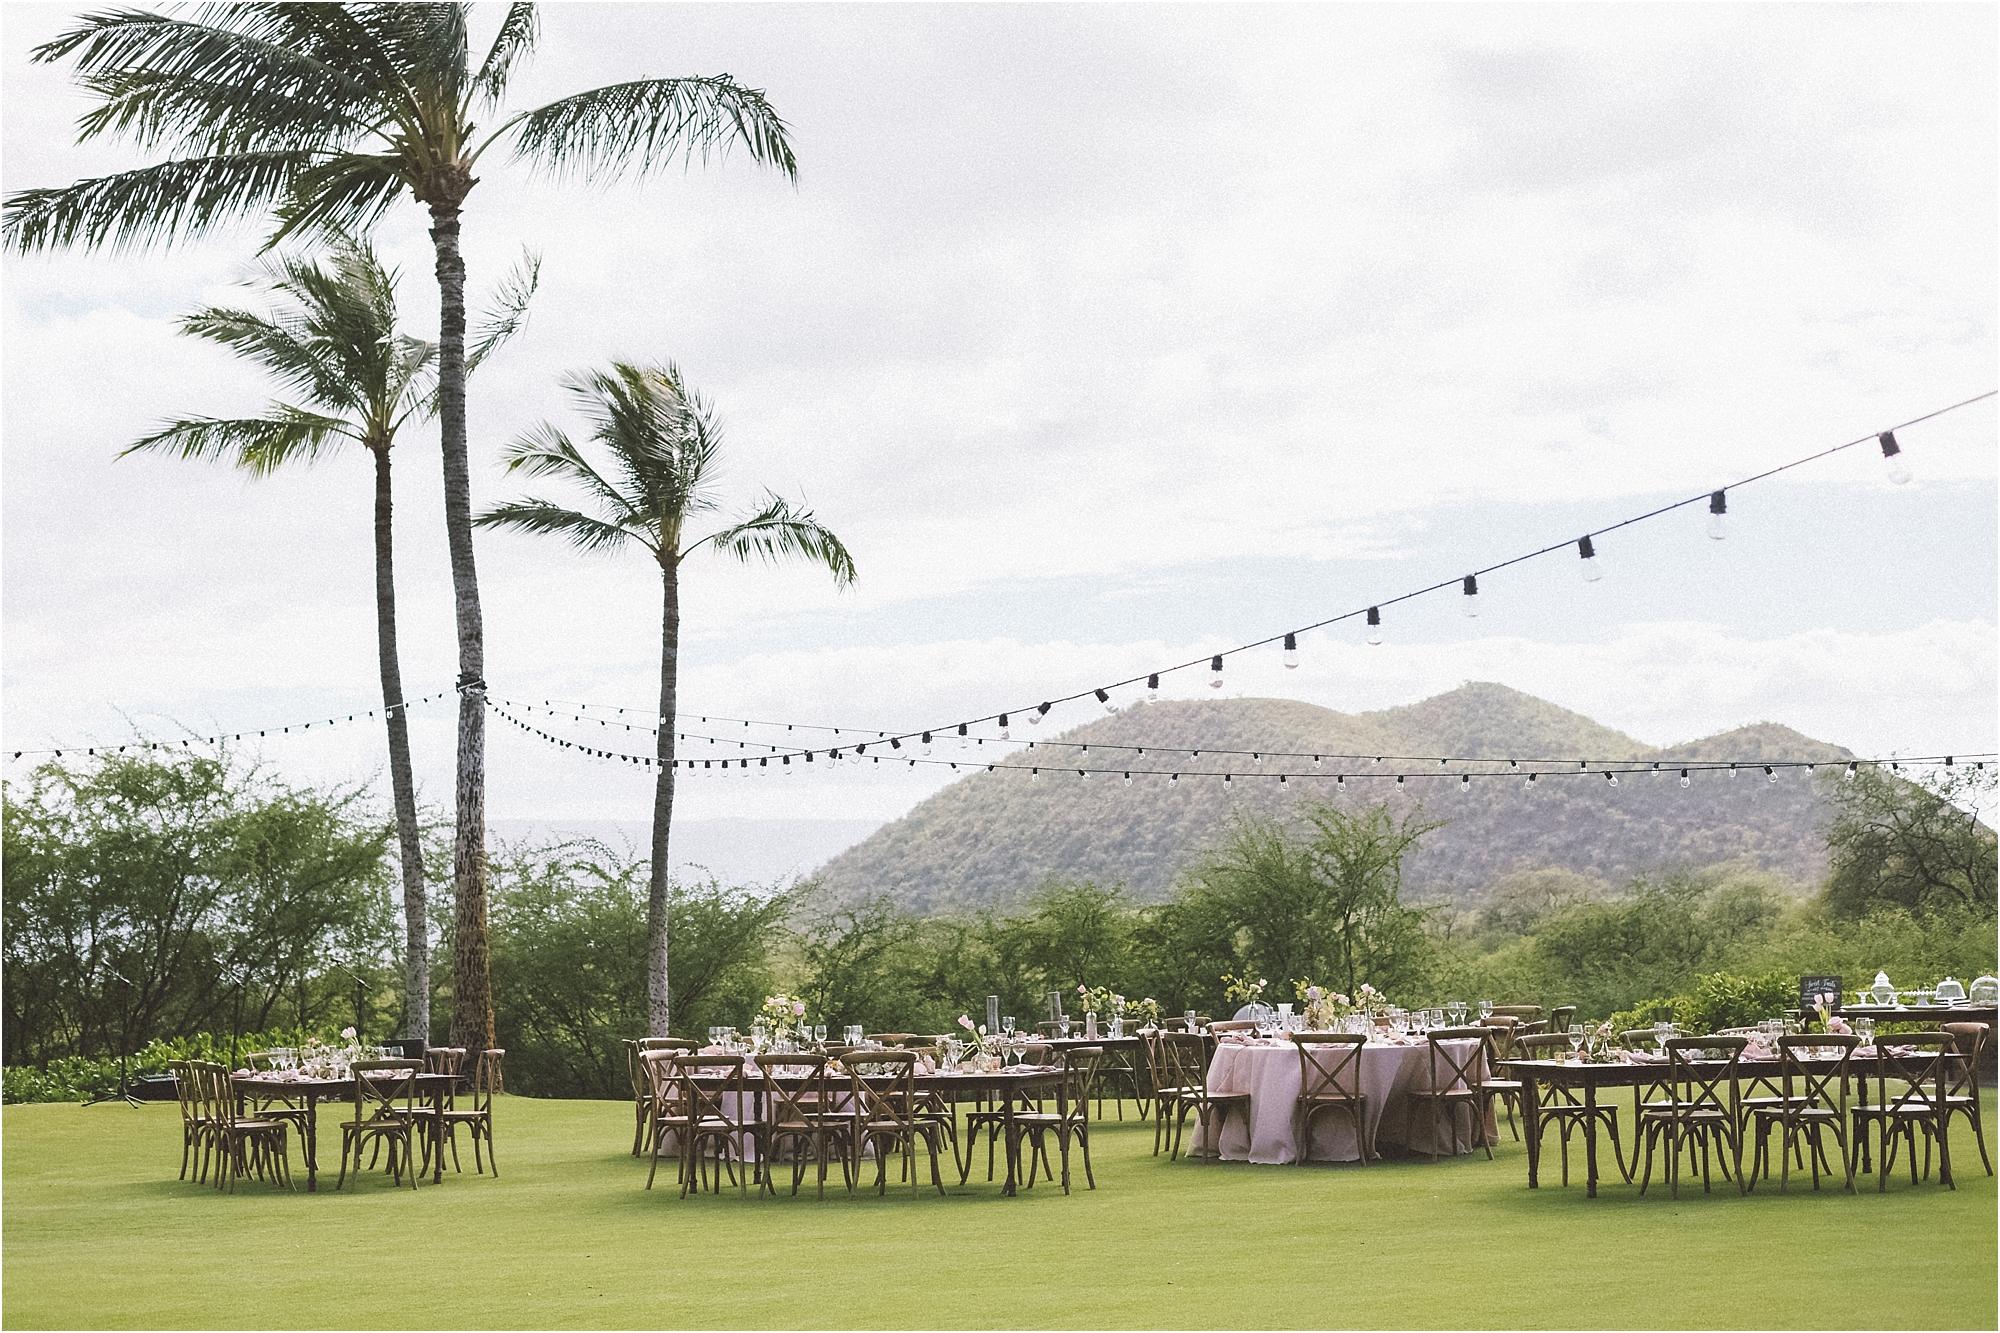 angie-diaz-photography-maui-hawaii-destination-wedding-makena-golf-beach-club_0034.jpg